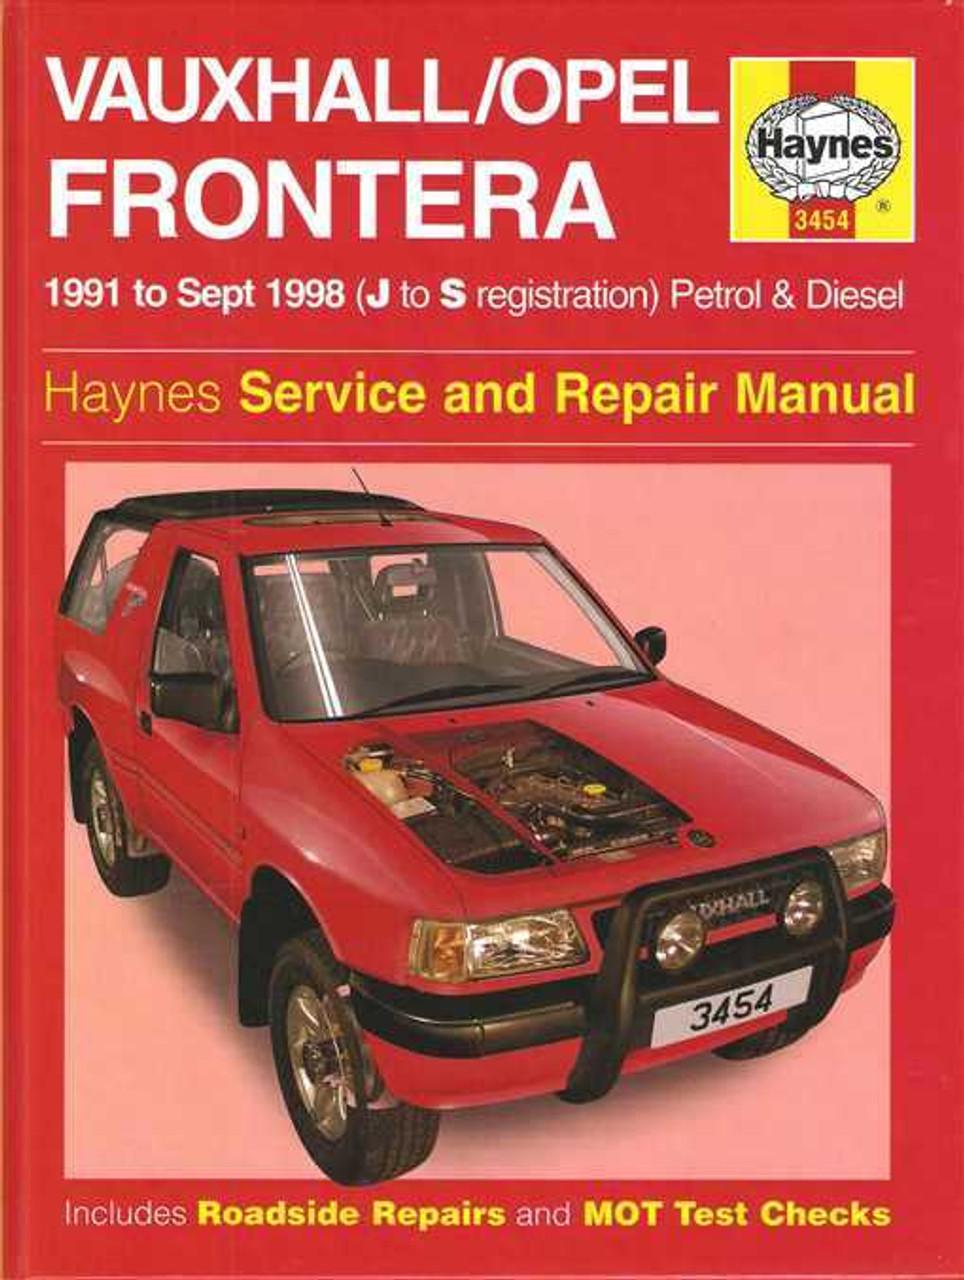 holden frontera petrol and diesel 1991 1998 workshop manual rh automotobookshop com au Holden Sports Car Holden Barina Car